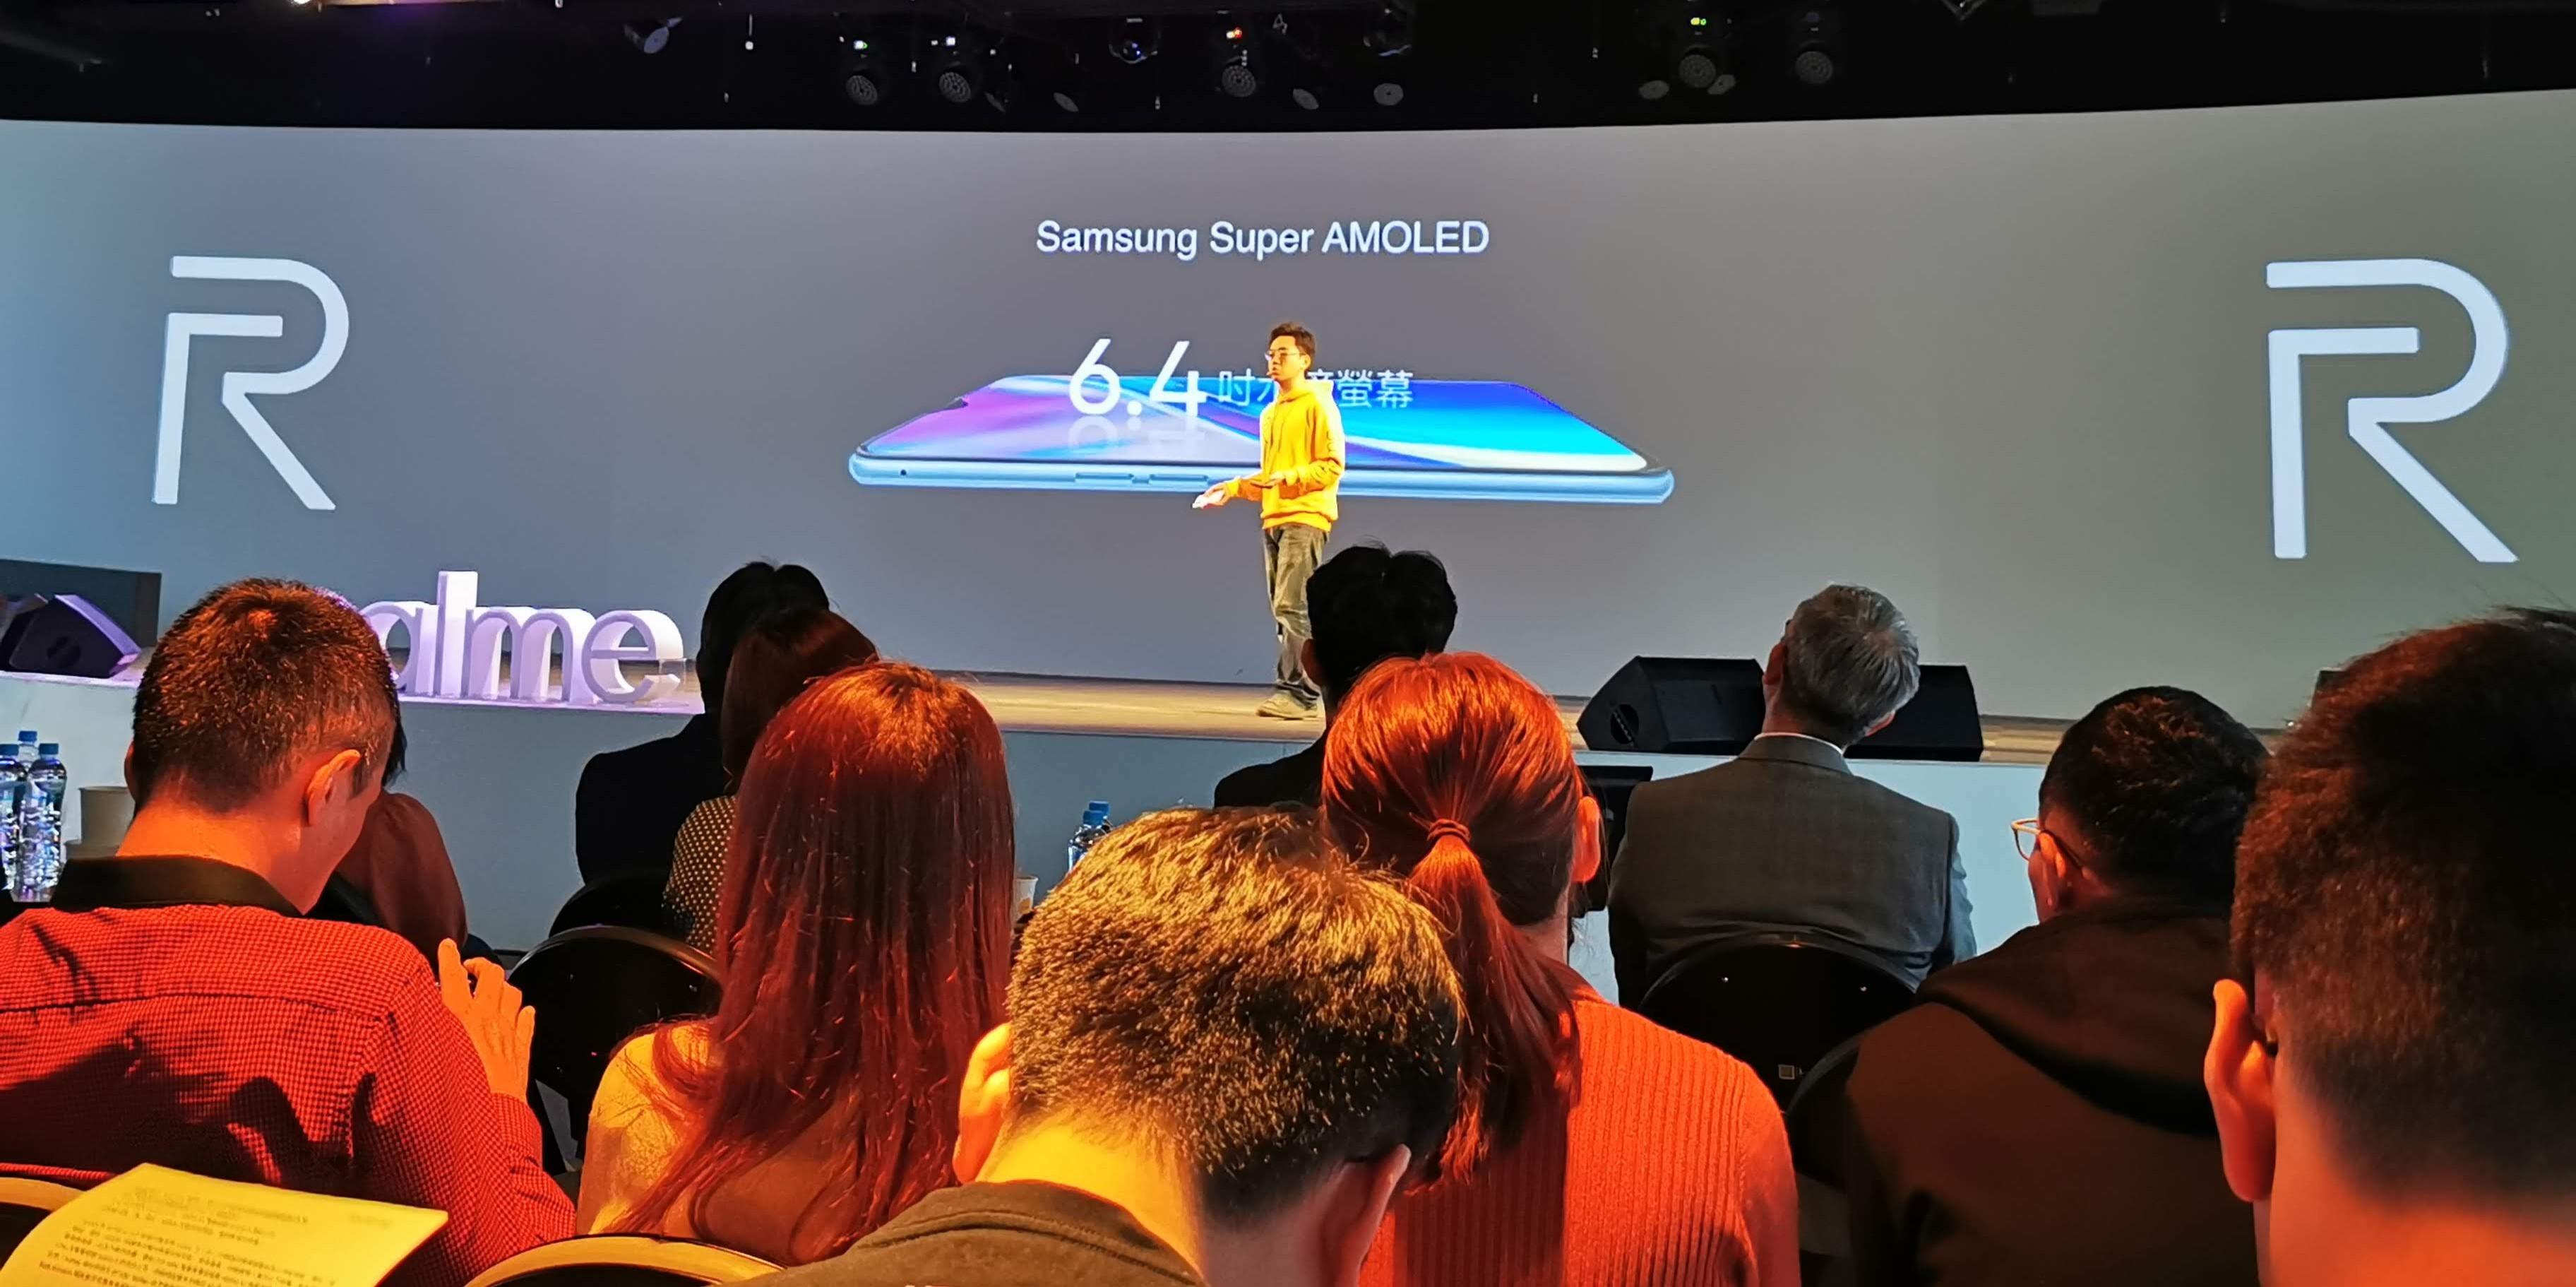 realme XT 正面則配備6.4吋Super AMOLED水滴螢幕,螢幕佔比高達91.9%